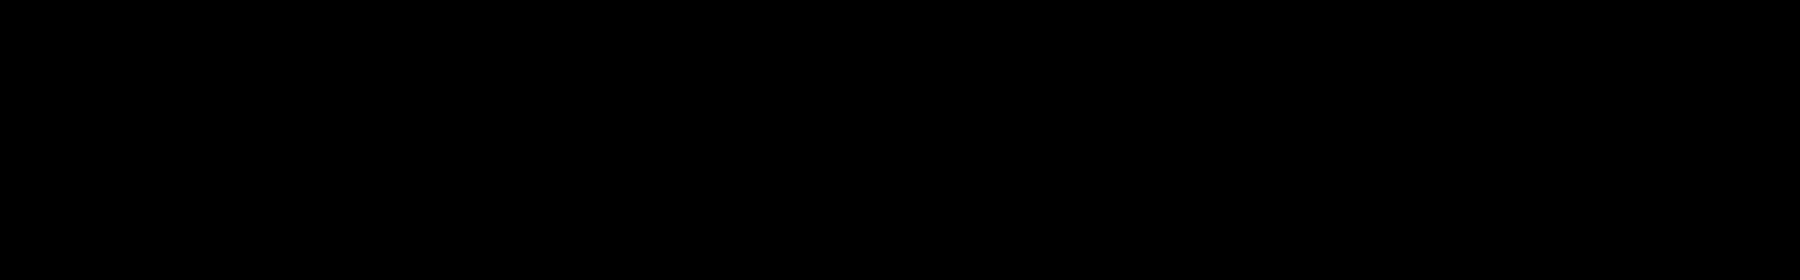 MASSIVE OSCILATE II audio waveform